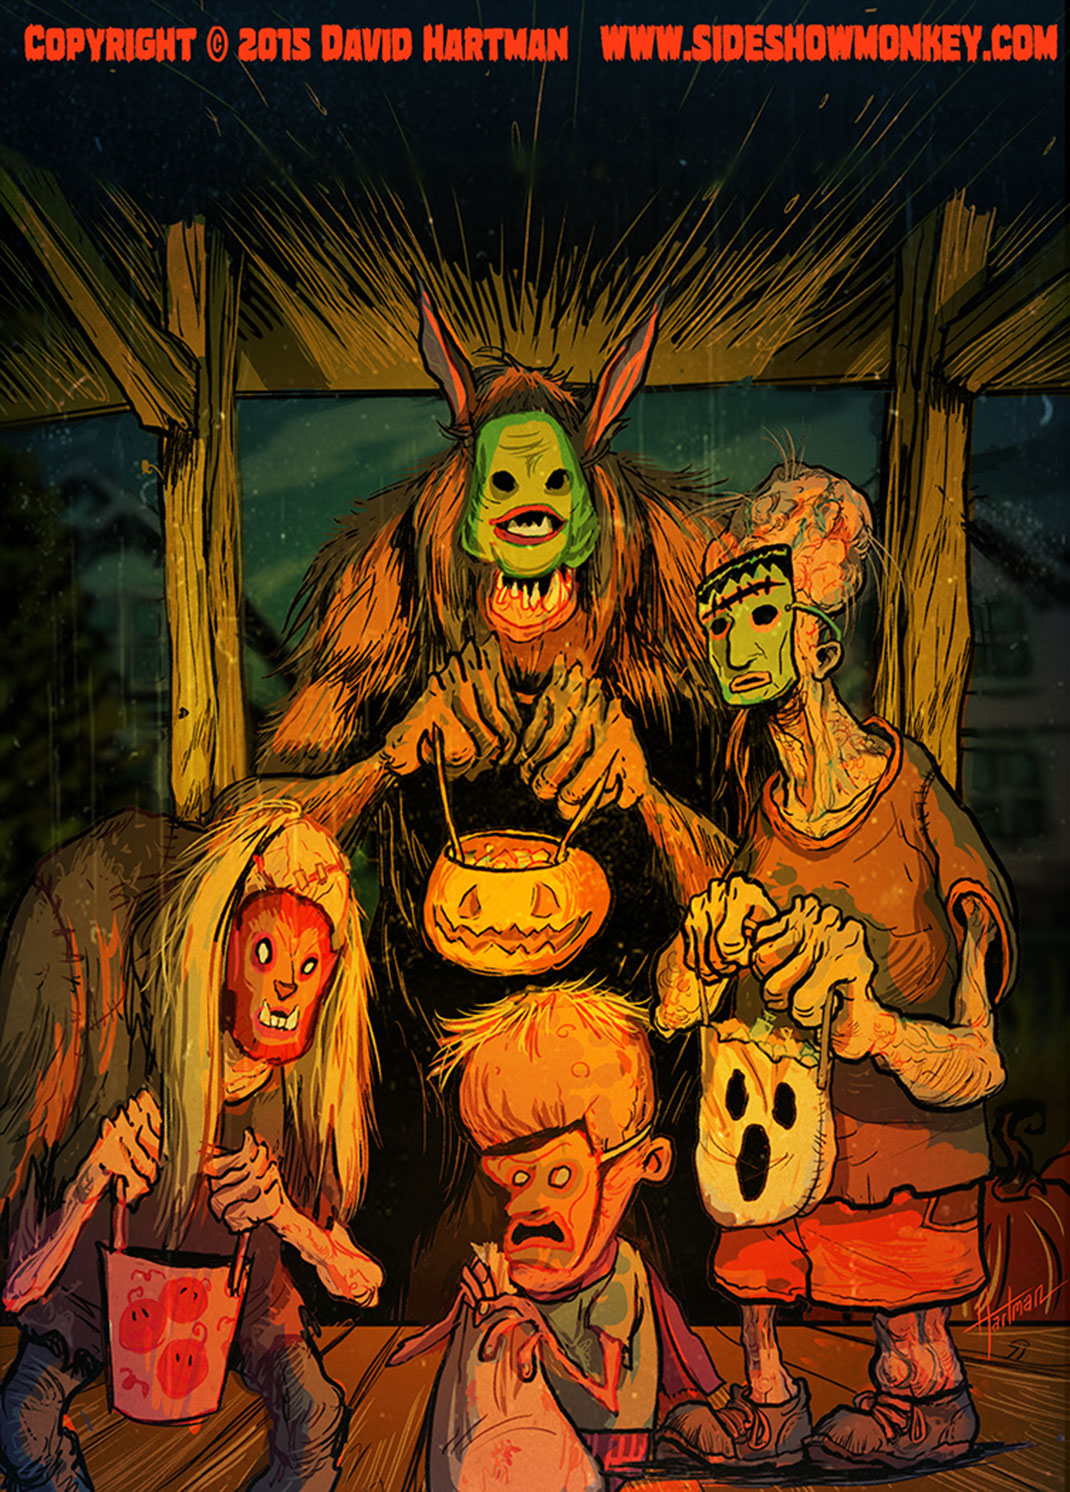 spooky-macabre-style-horror-illustrations-by-david-hartman